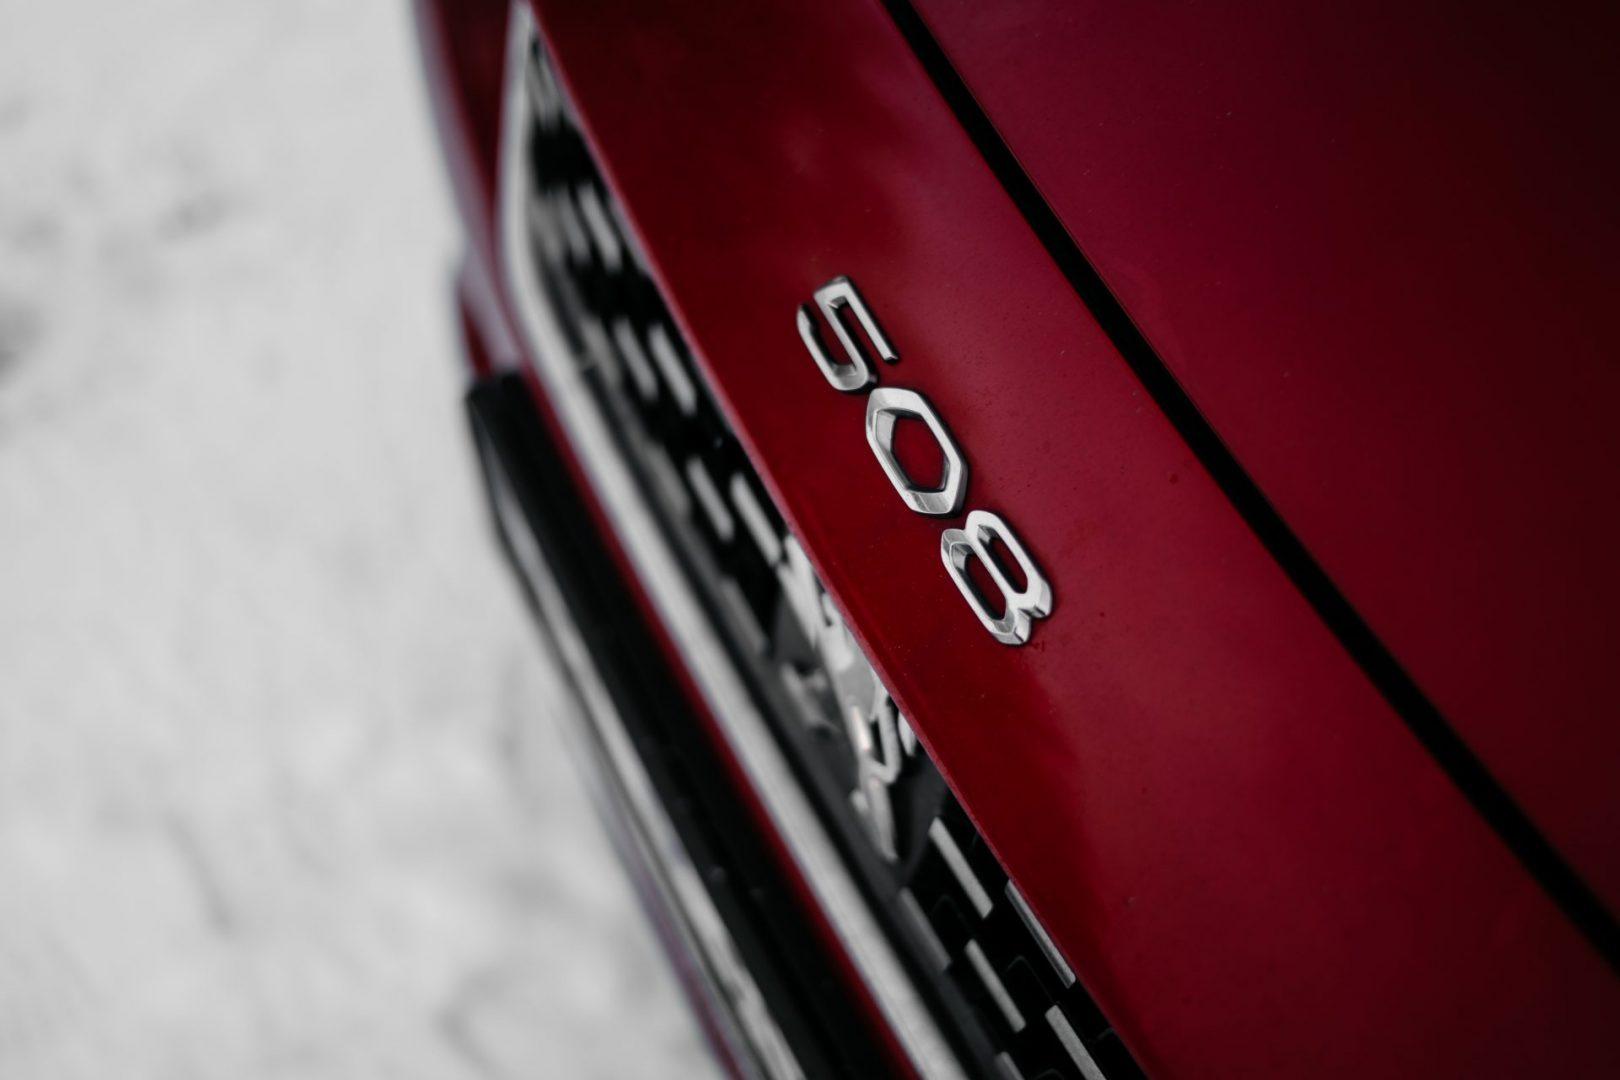 peugeot 508 GT Line detail